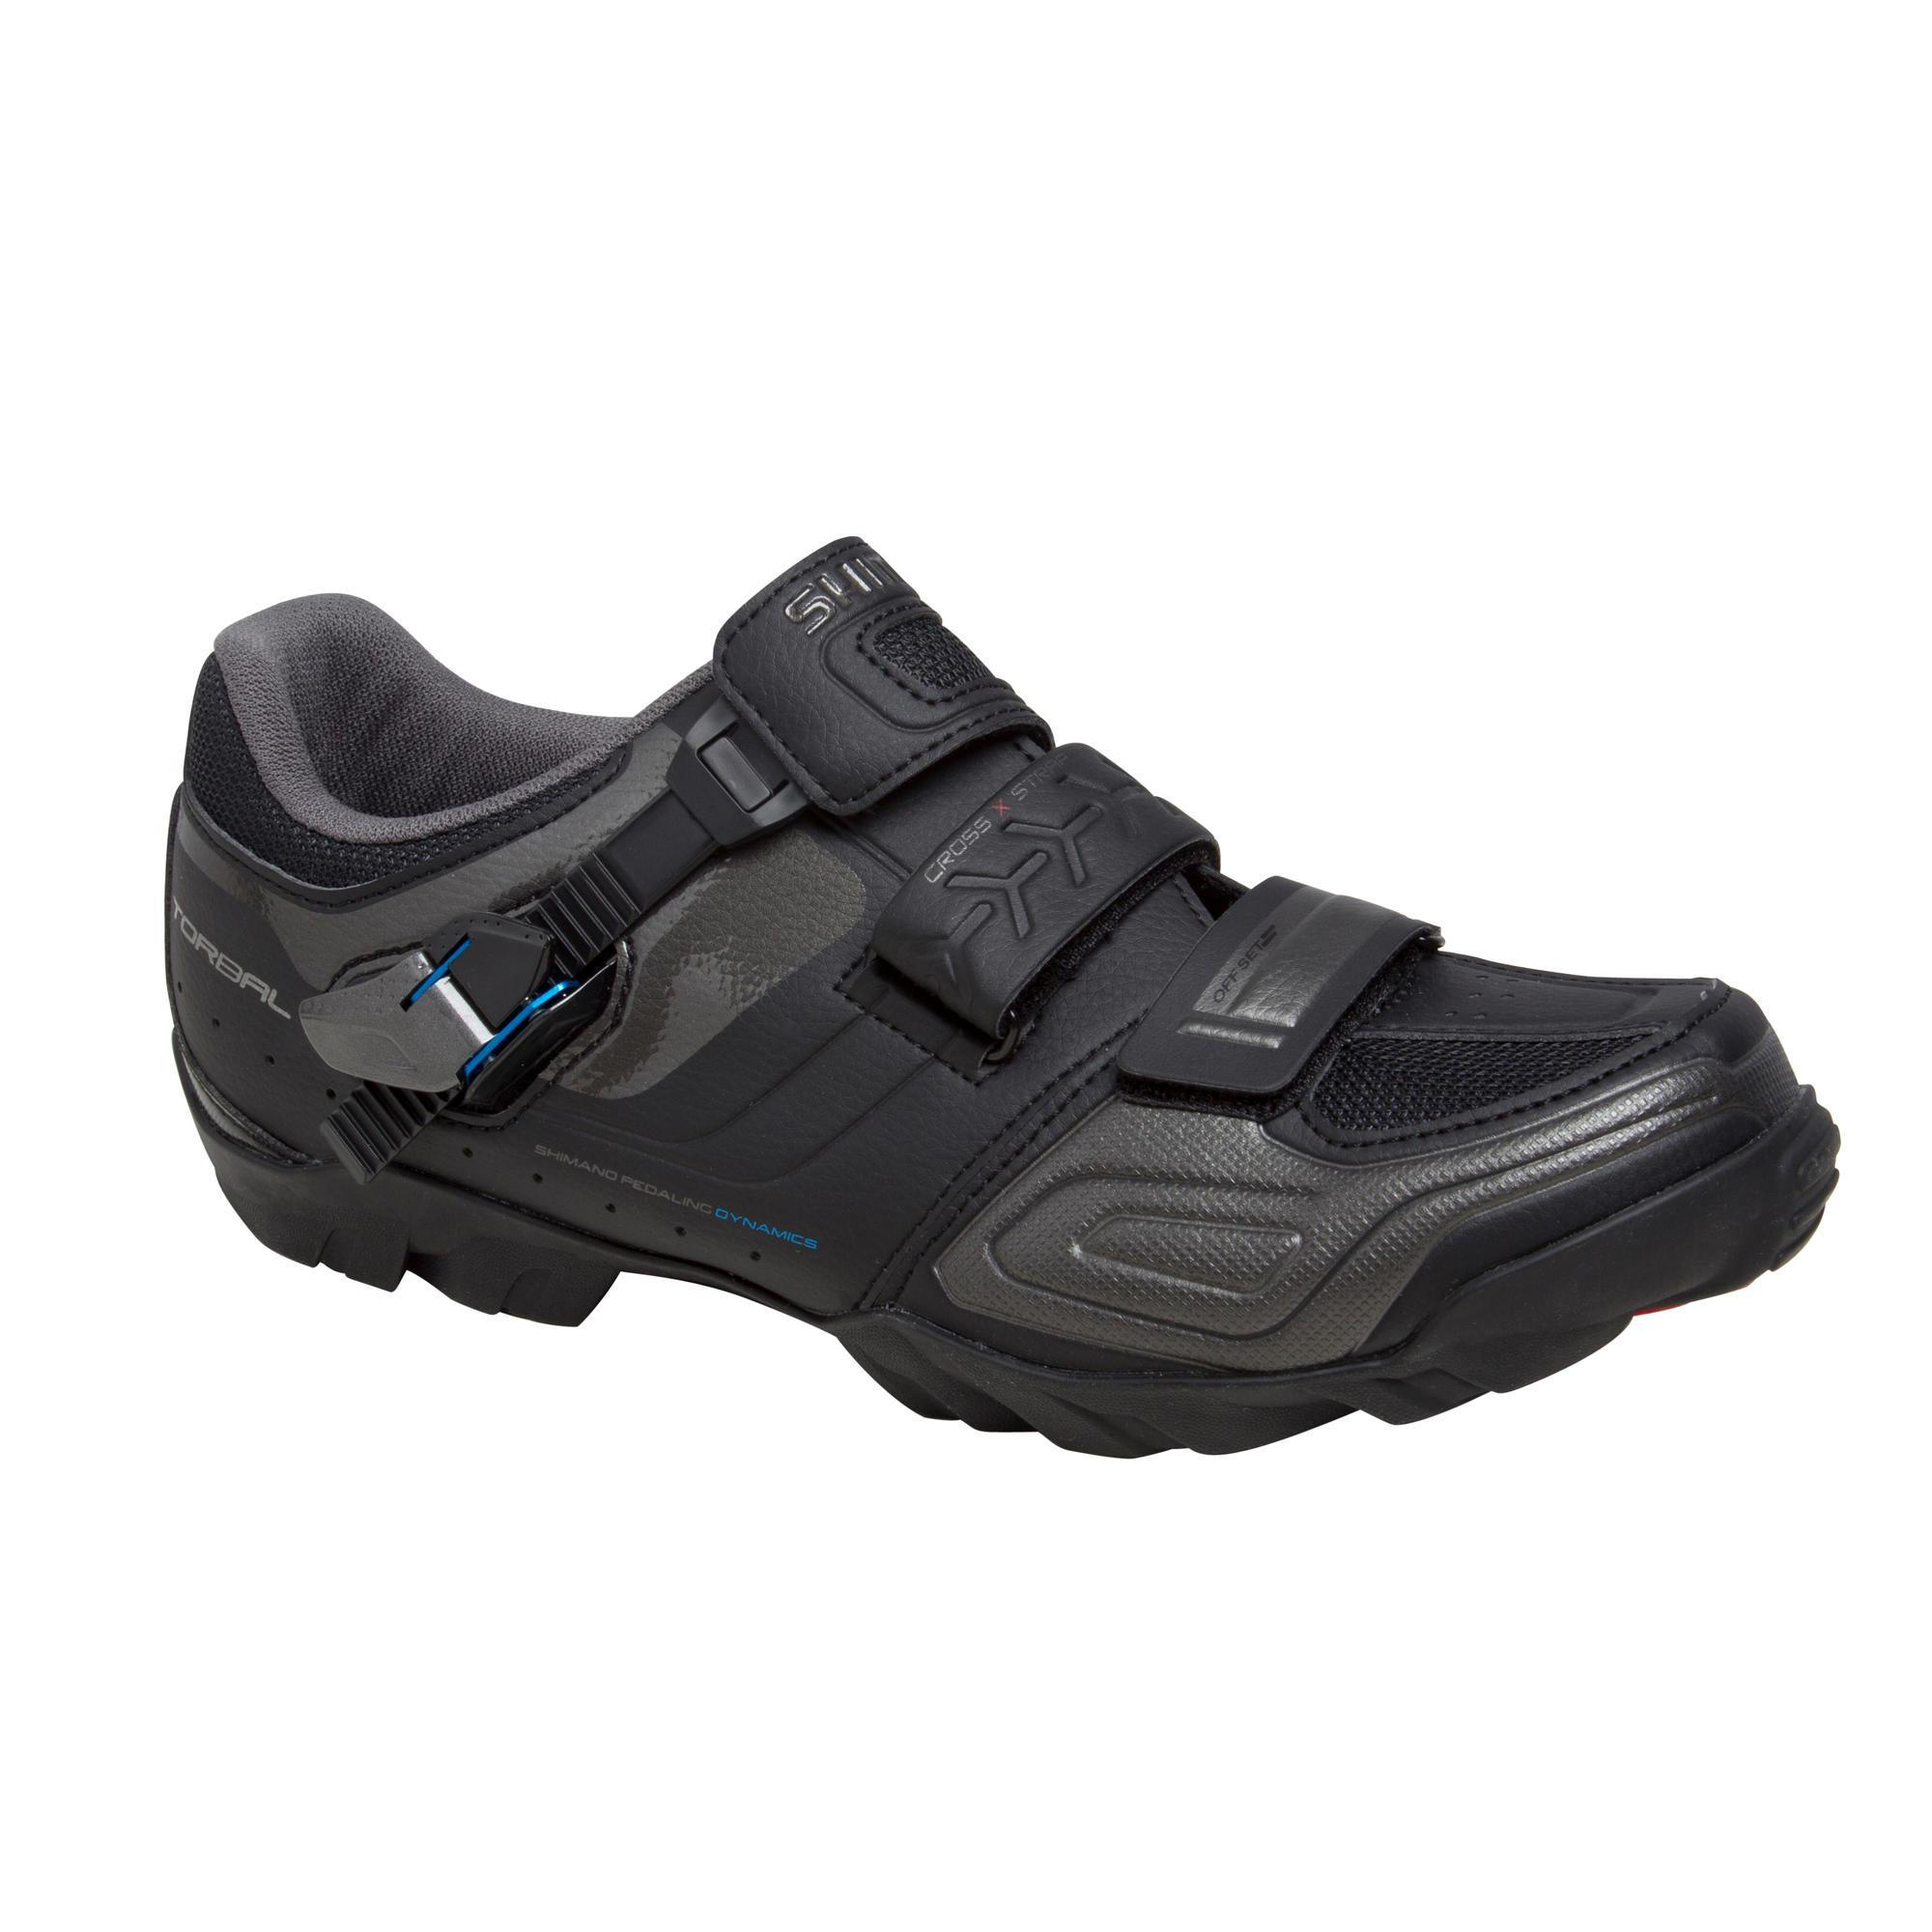 7608a5e4 Comprar Zapatillas Deportivas de Hombre online | Decathlon